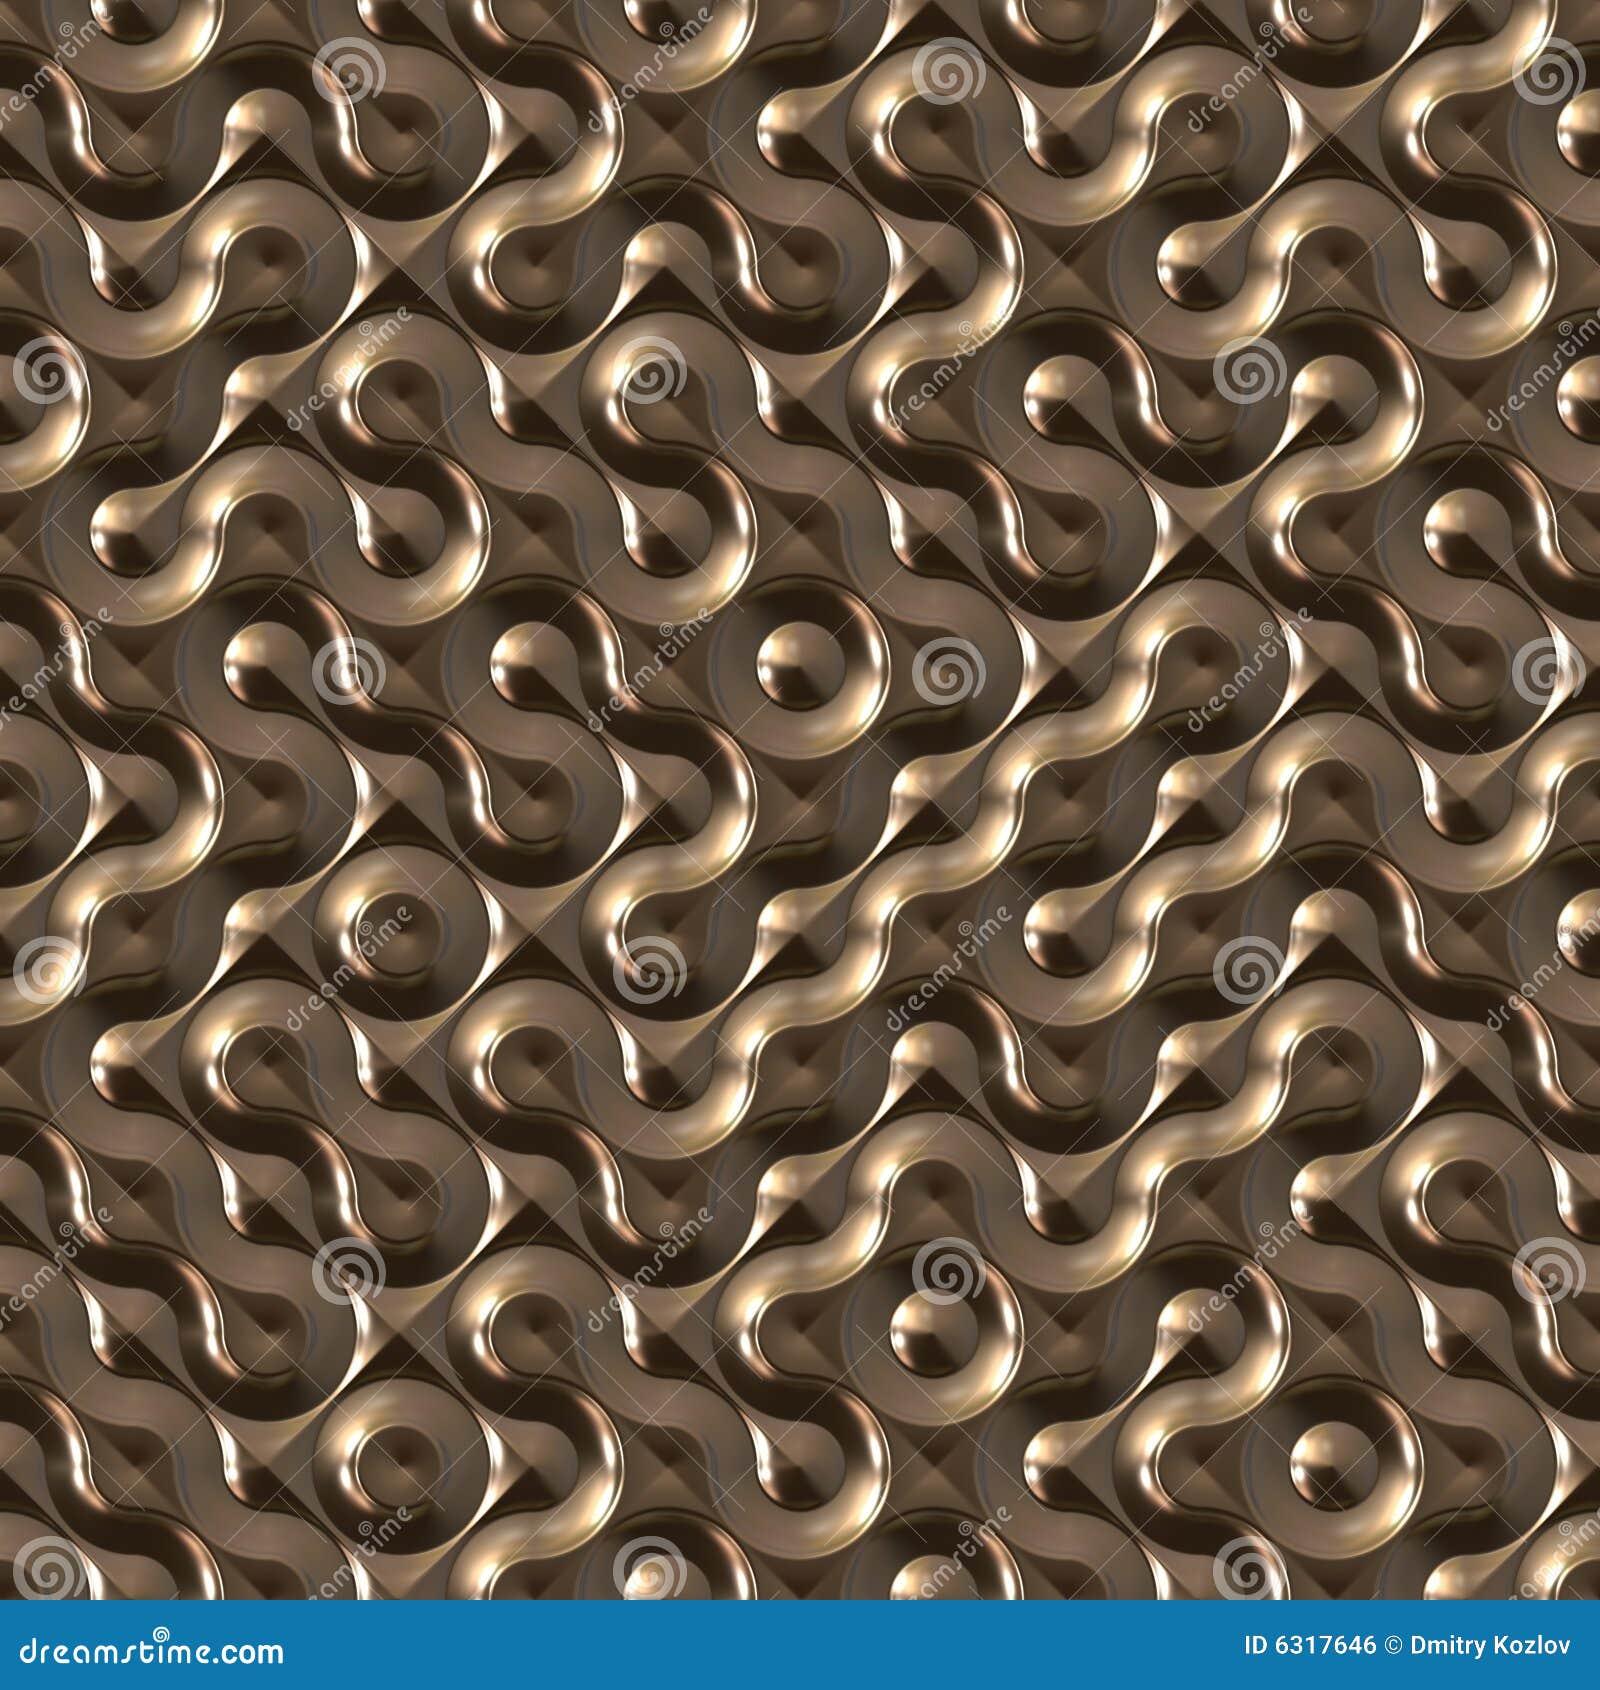 textura metalica futurista chanel - photo #5